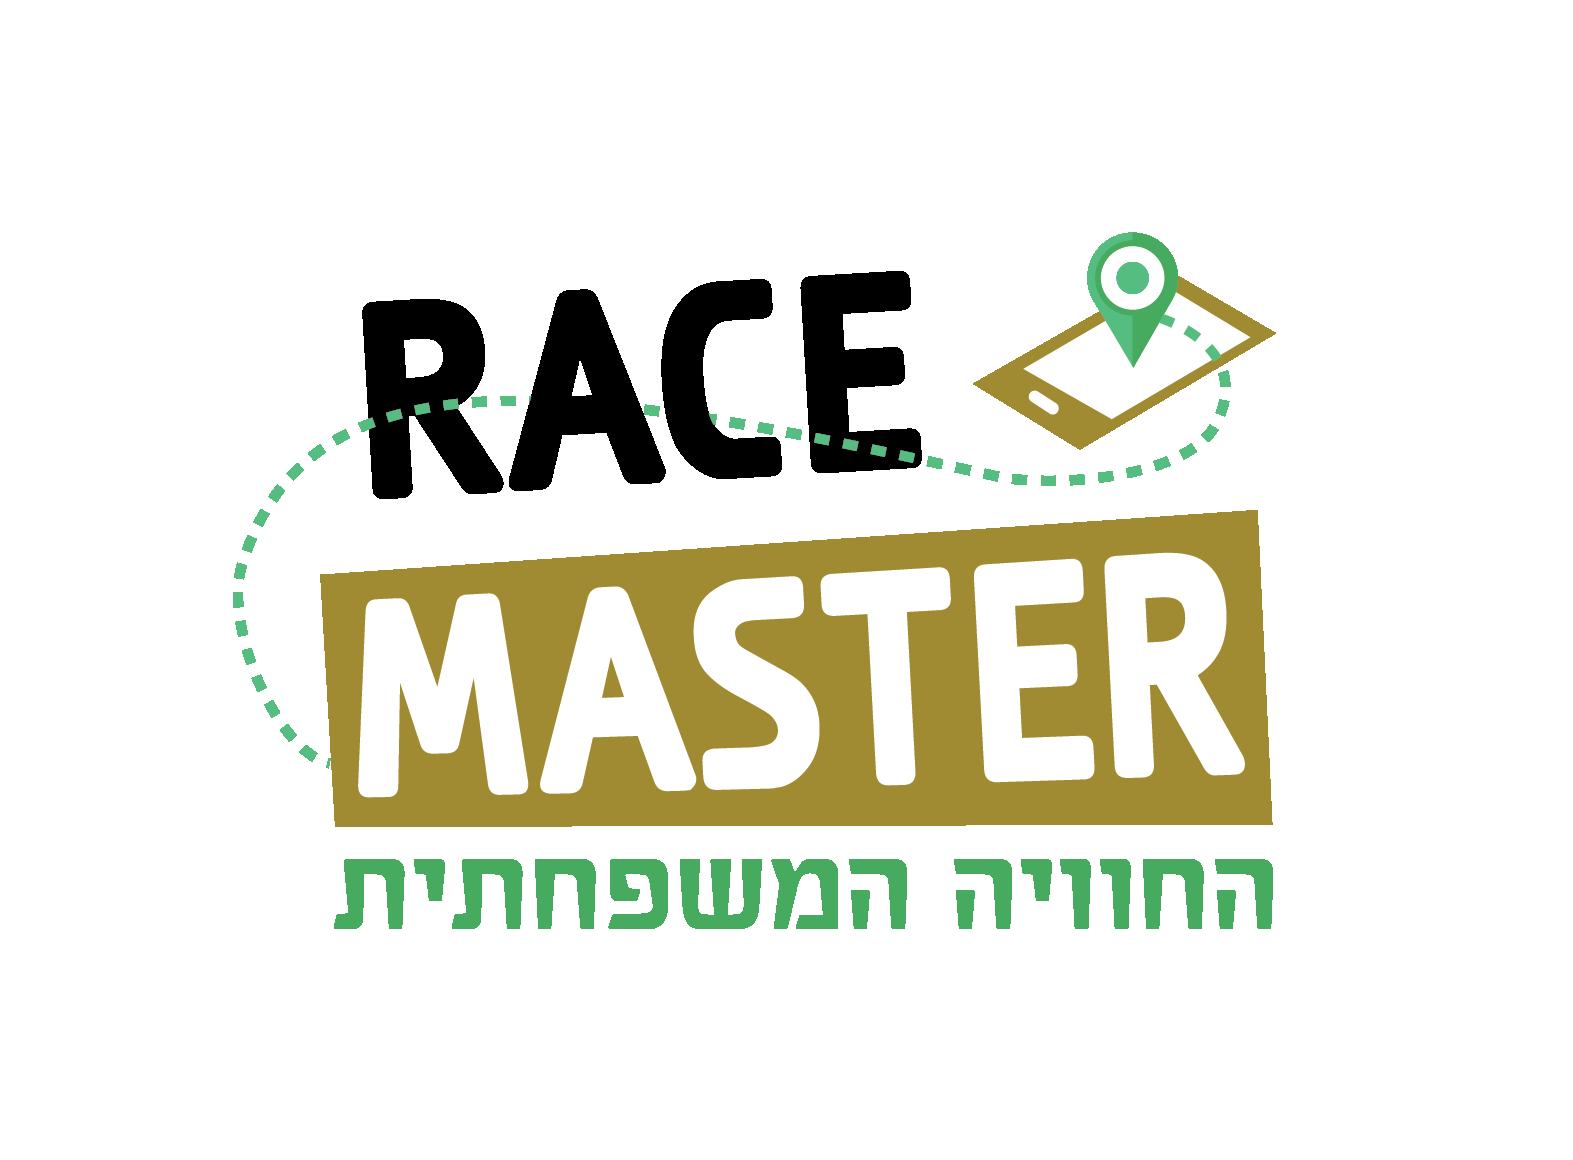 Race Master - החוויה המשפחתית